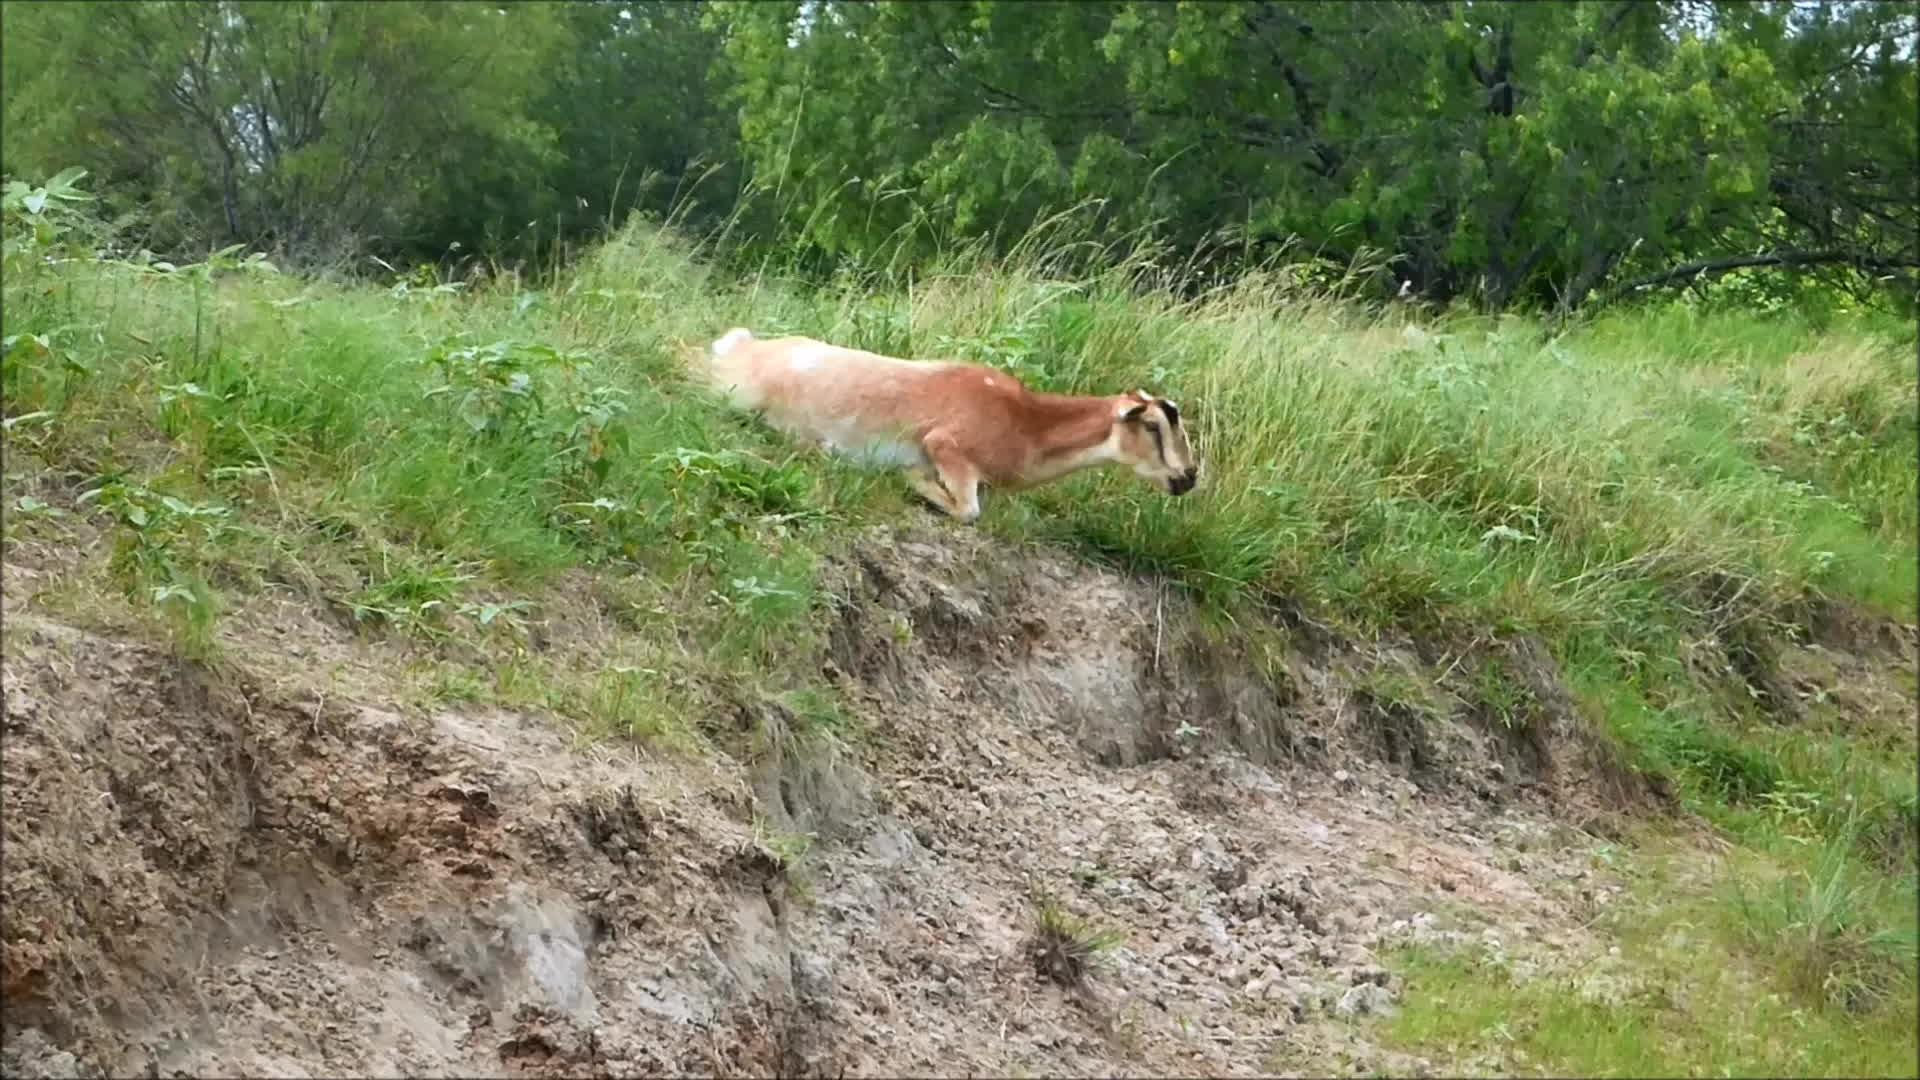 Goatparkour, freecompliments, goats, knsfarm, Goat Rolls Down Hill GIFs